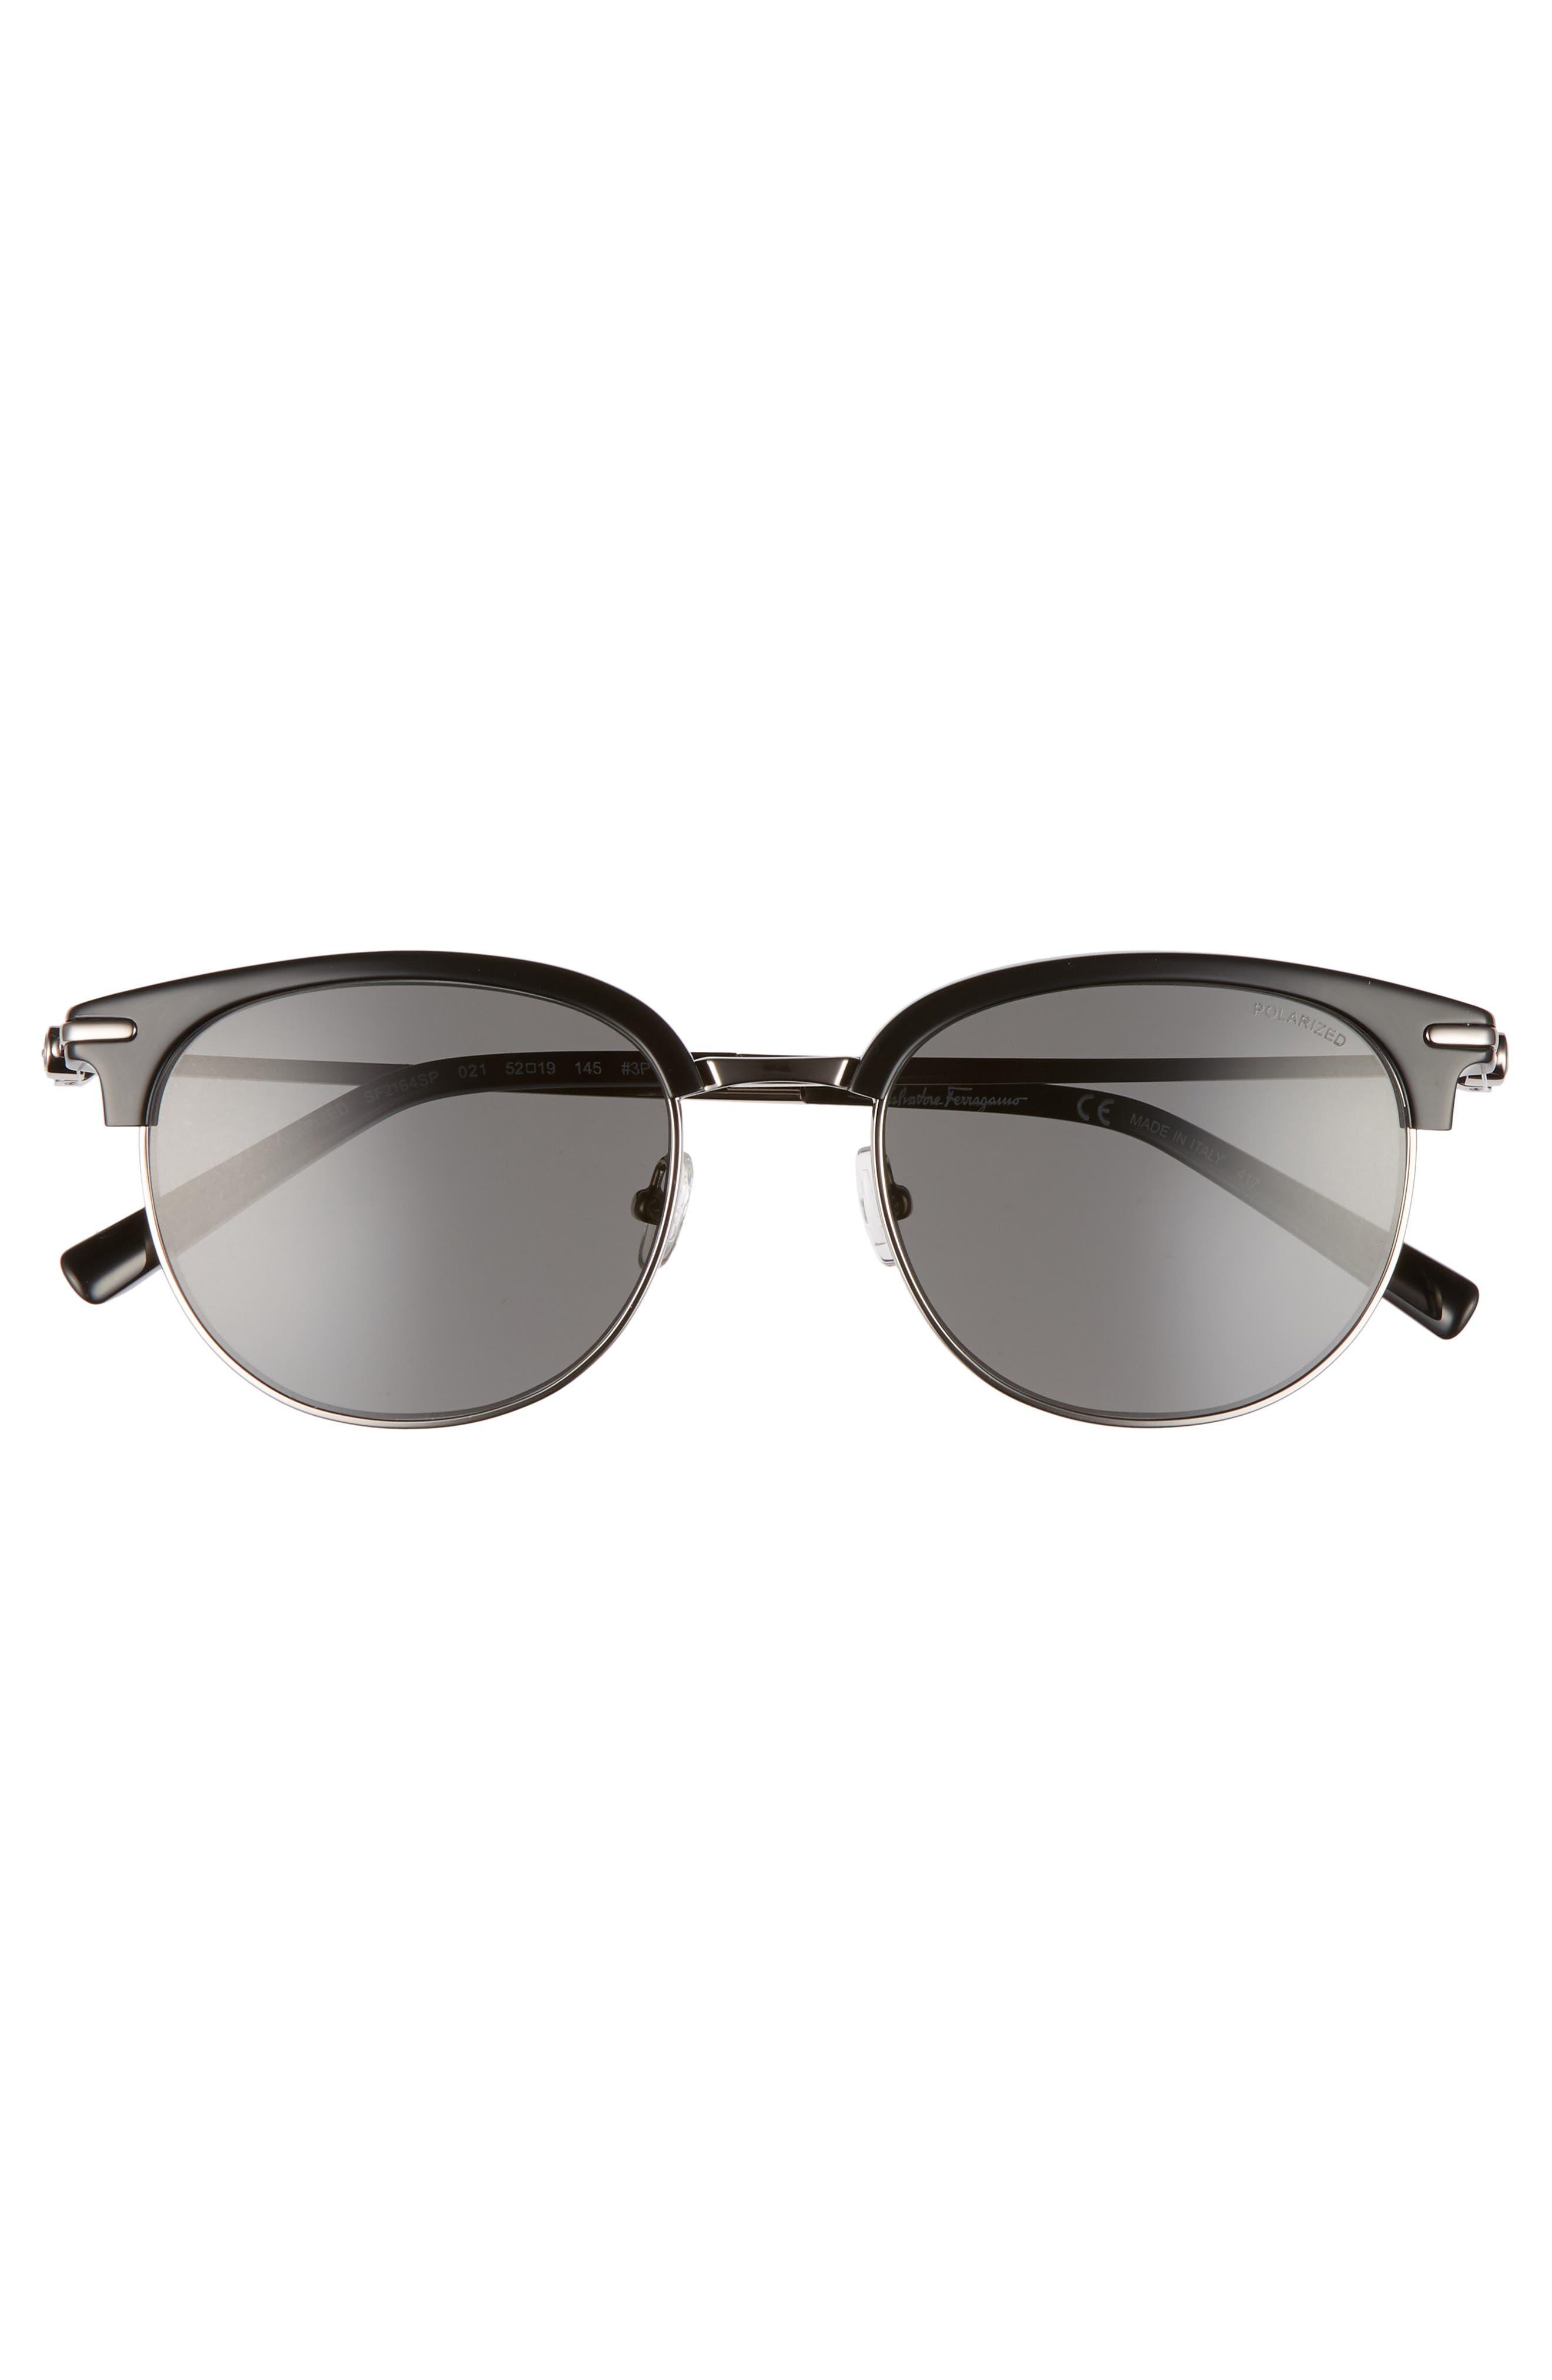 Double Gancio 52mm Polarized Sunglasses,                             Alternate thumbnail 2, color,                             BLACK/ RUTHENIUM